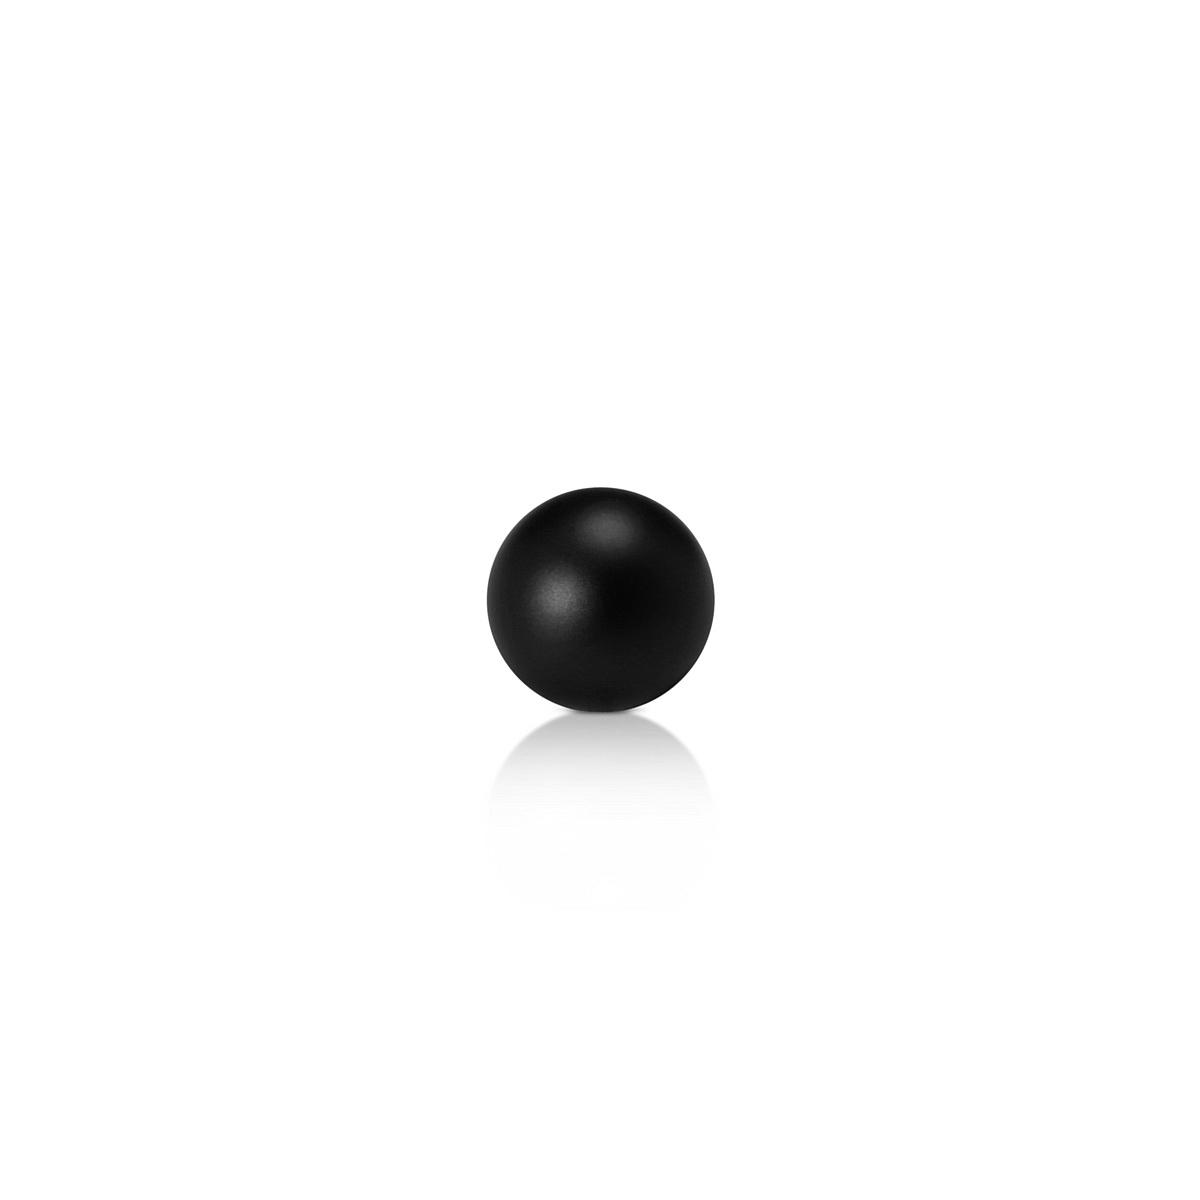 Set of 2 End-Ball 5/8'' Diameter for  ''RSP' Projecting Sign Kit - Aluminum Black Matte Finish